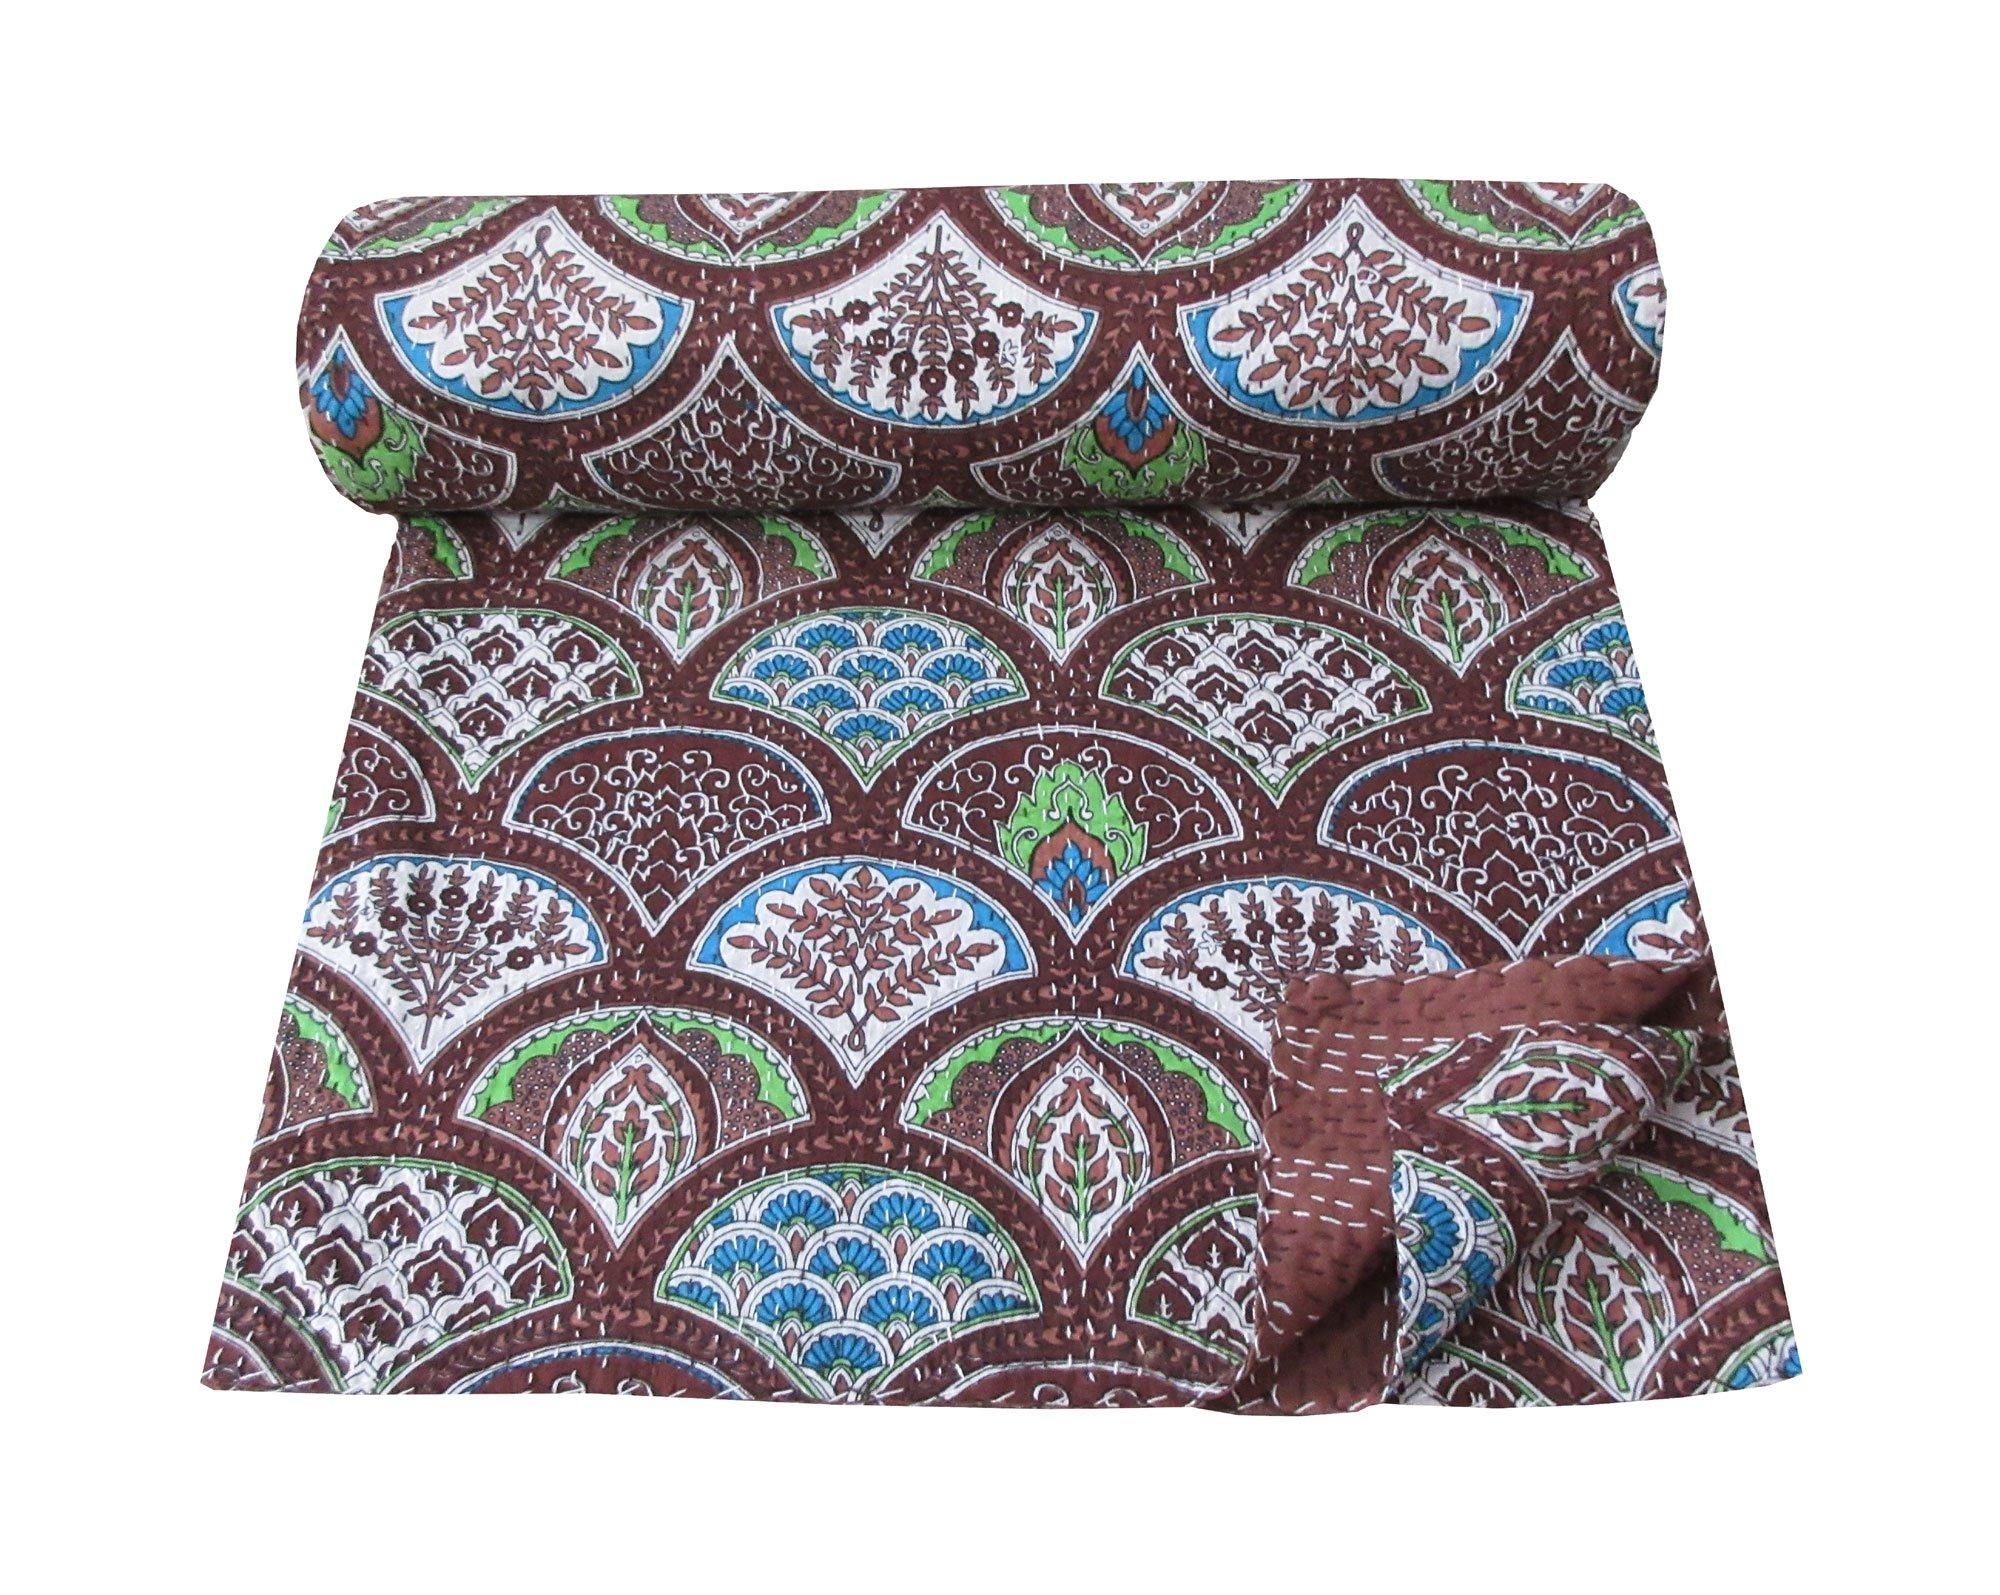 Magic Indians Brown Handmade Sari Kantha Quilt Floral Bird Design Kantha Bedspread Indian Cotton Kantha Blanket Kantha Bed Cover Queen Size Kantha Beach Throw Picnic Throw Kantha Wall Decor